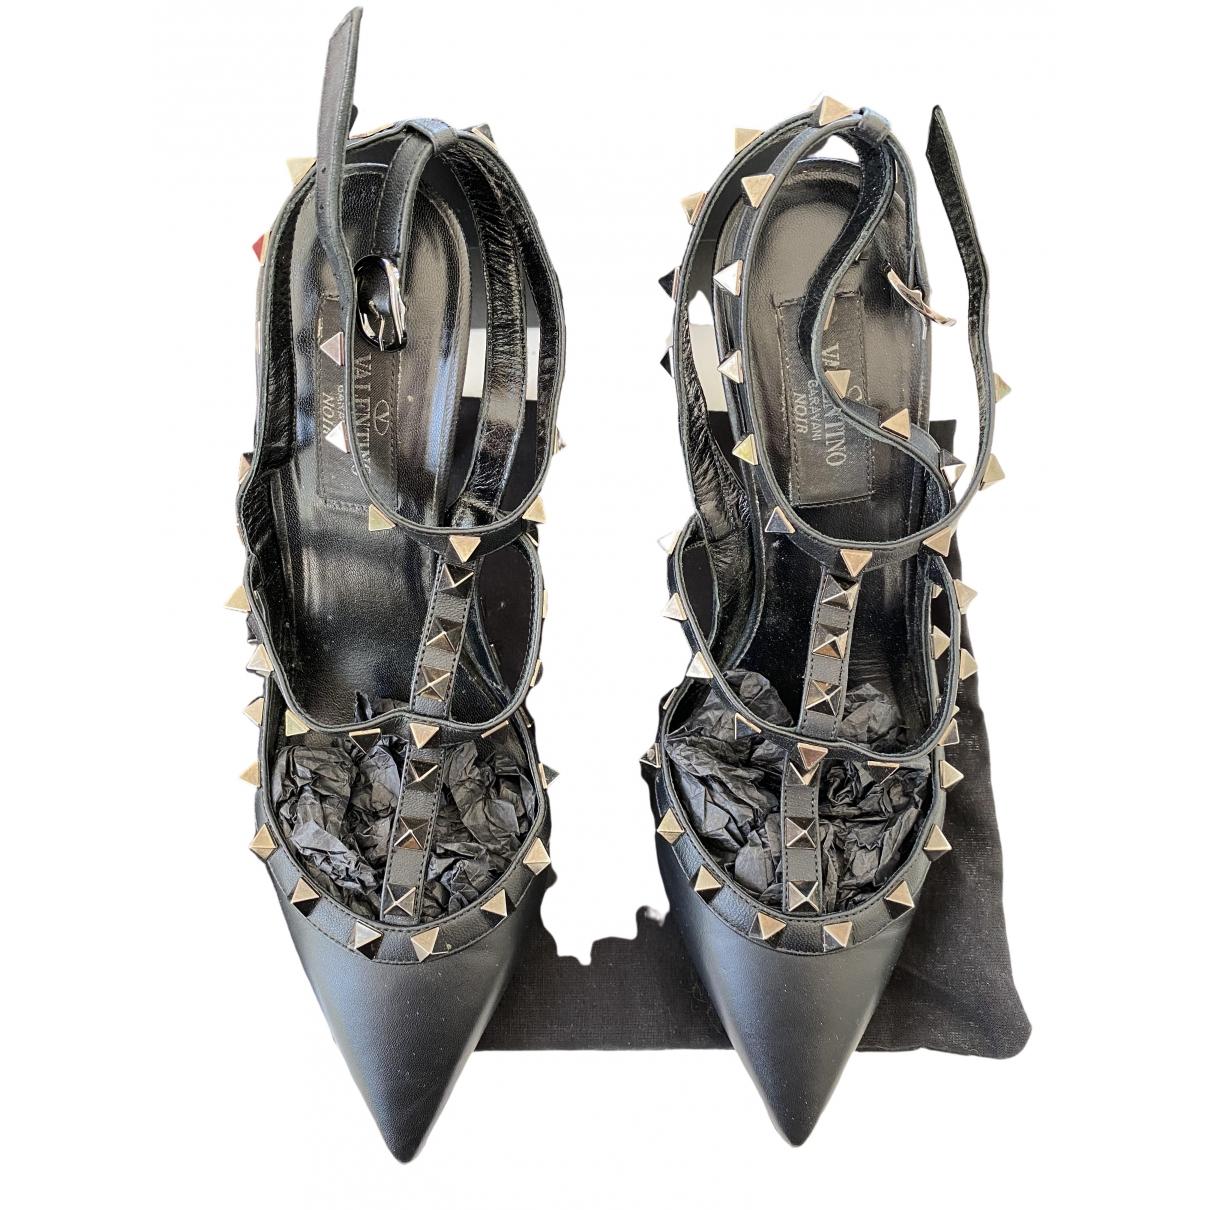 Valentino Garavani Rockstud Black Leather Heels for Women 38 EU